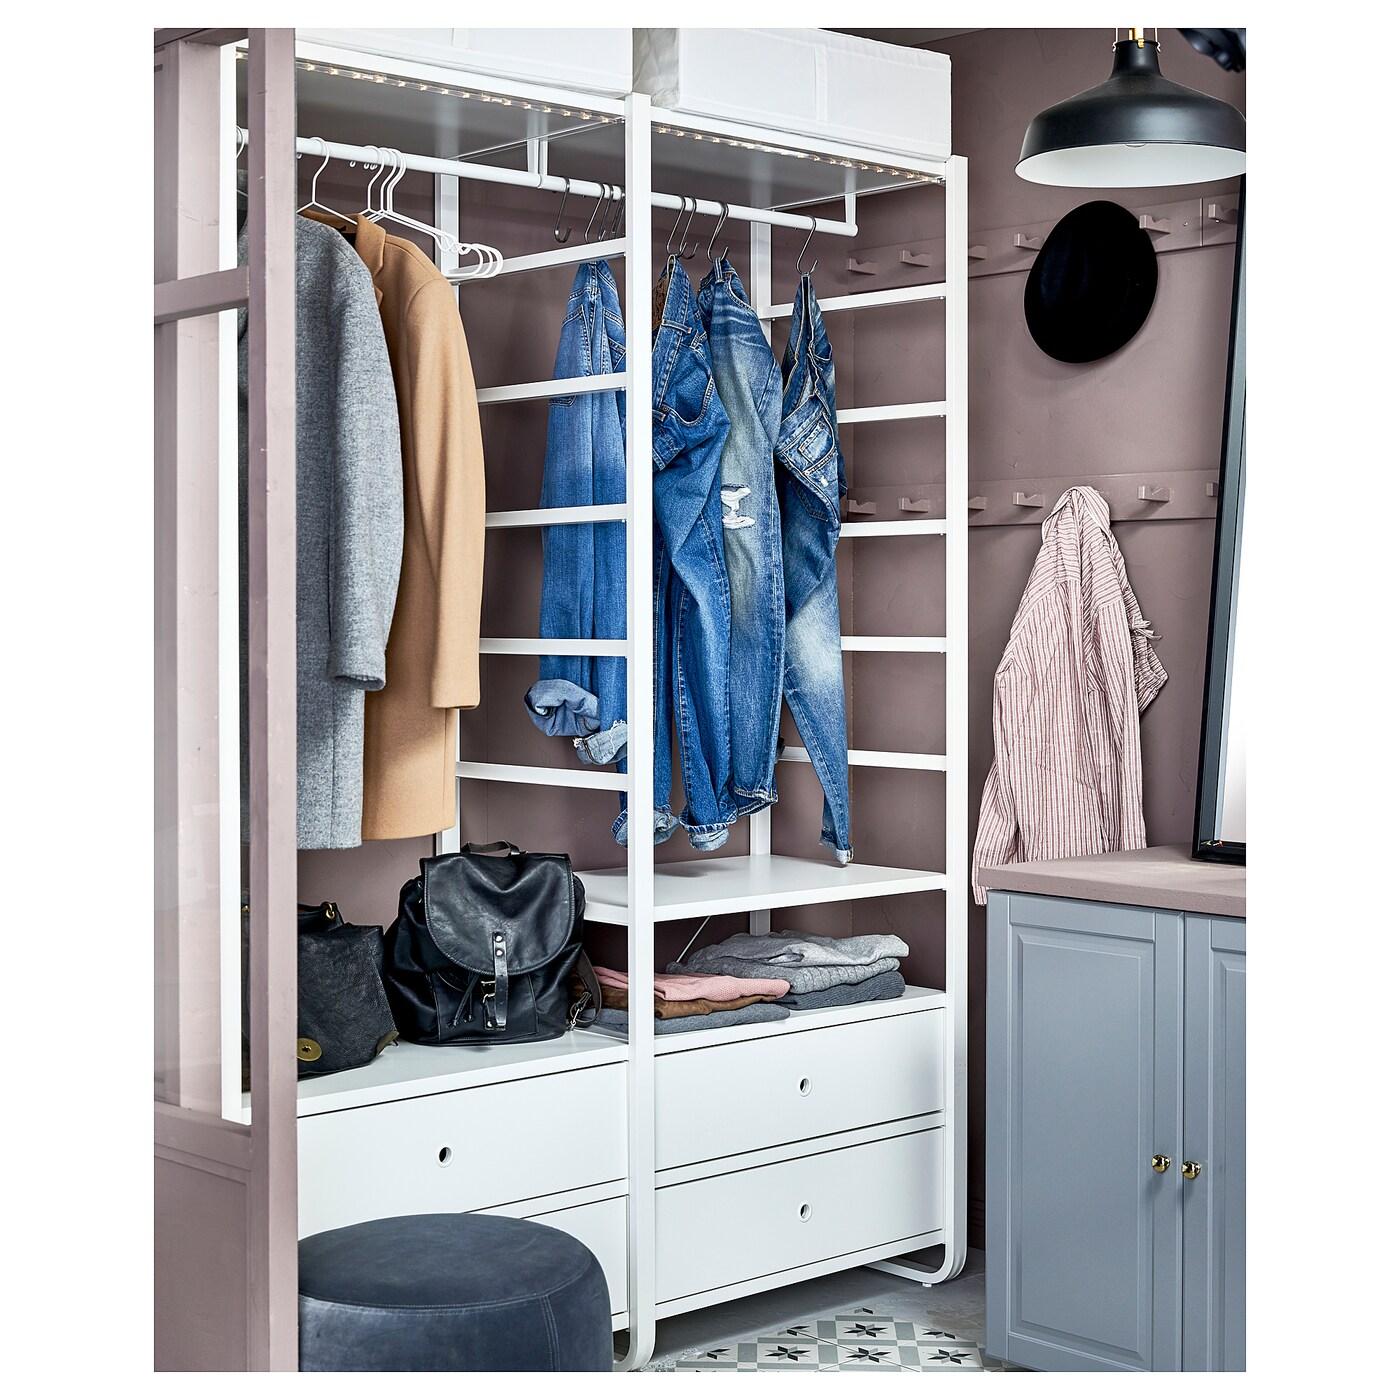 Elvarli 2 secciones blanco 165 x 55 x 216 cm ikea - Ikea cabina armadio planner ...